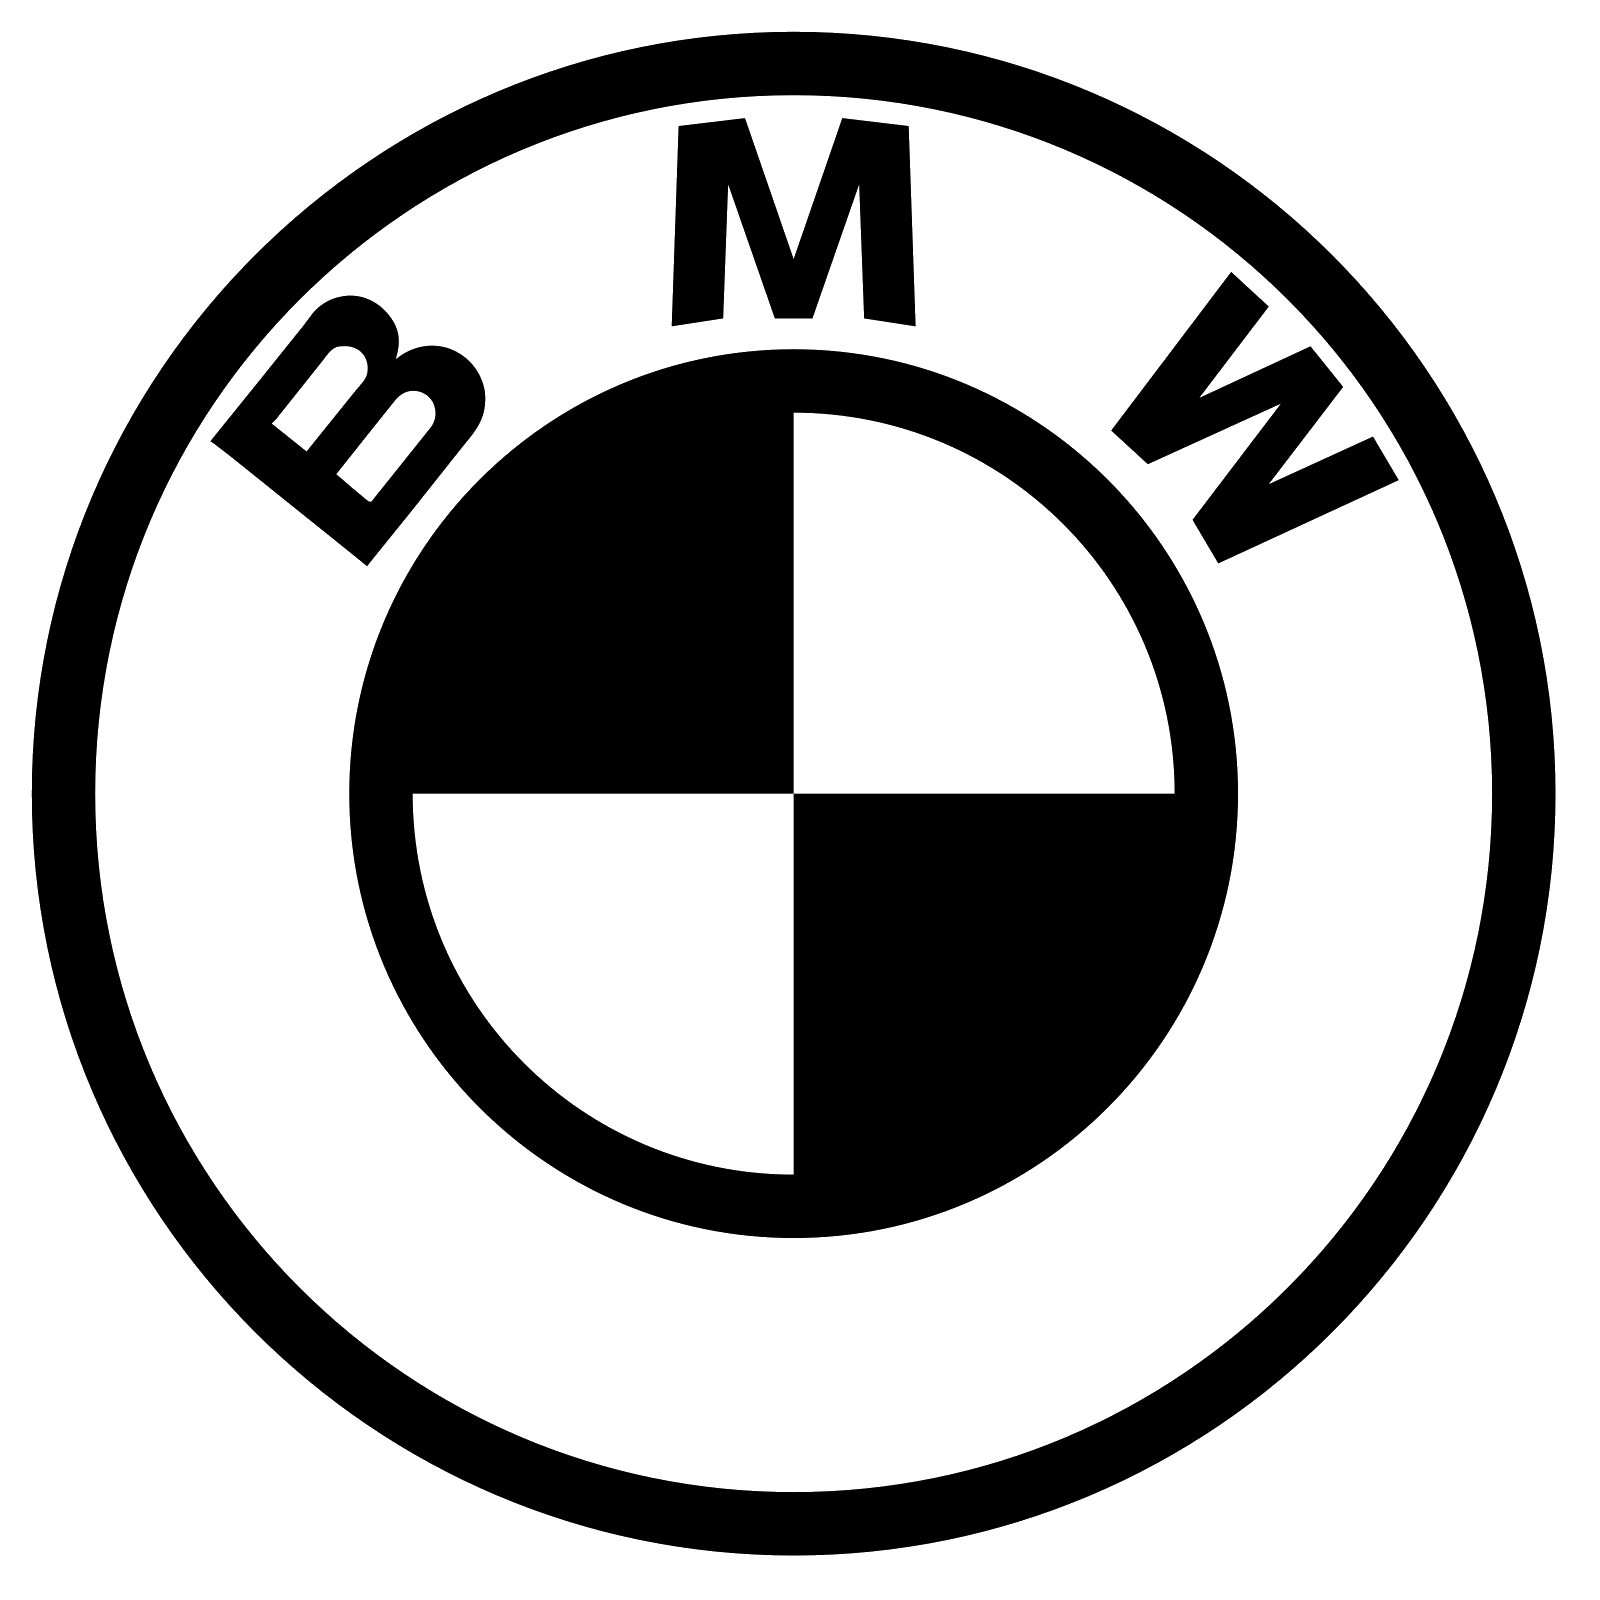 1600x1600 Bmw Icon